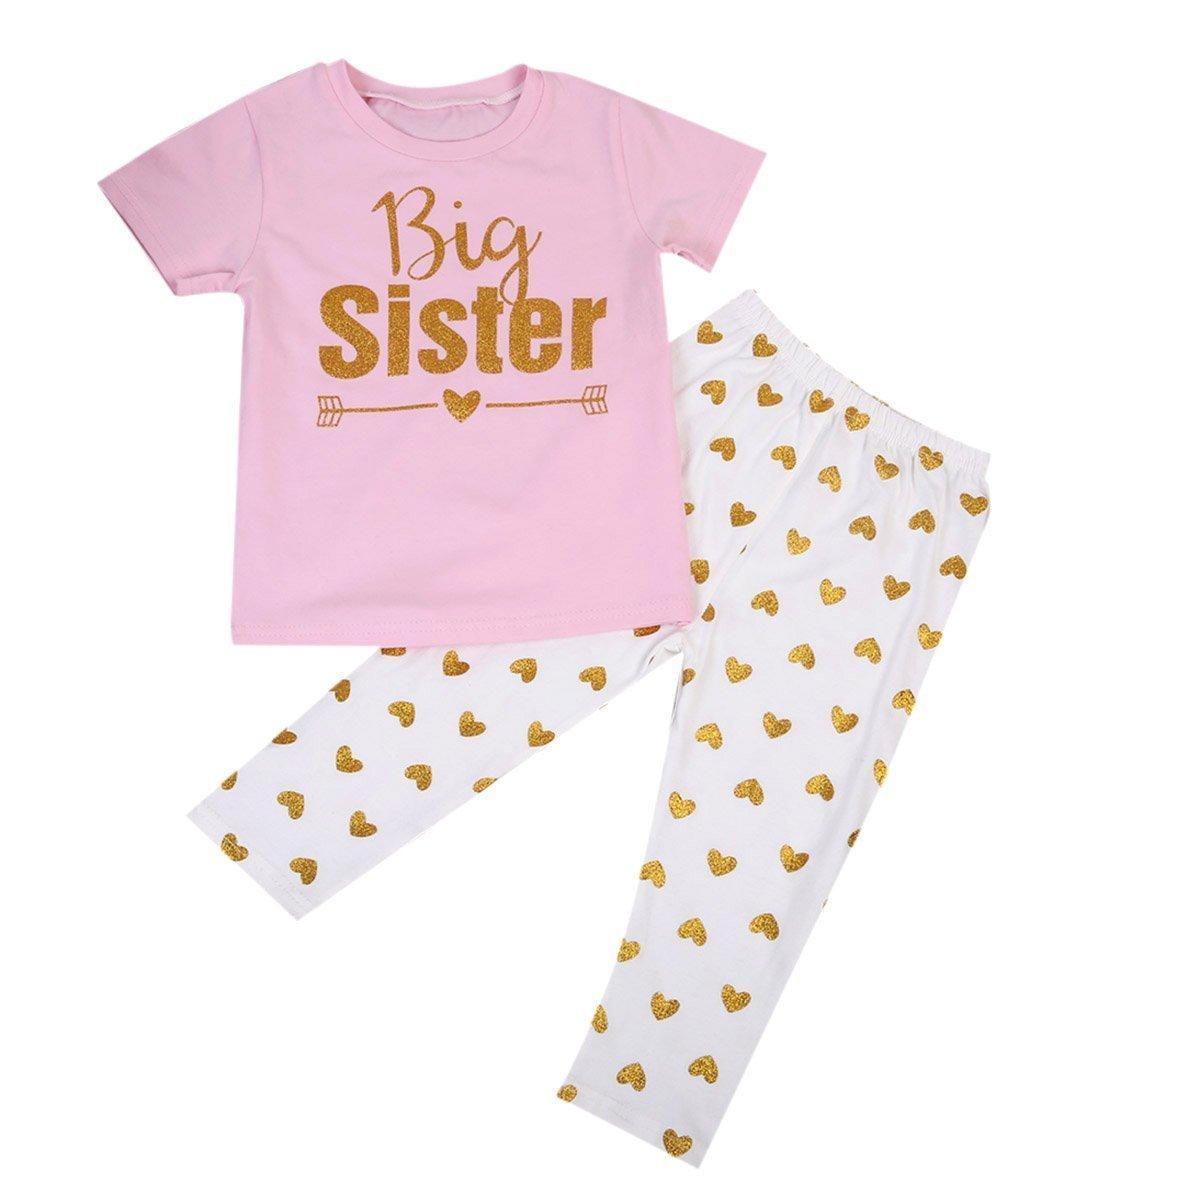 Baby Girl 2pcs Family Matching Clothing Set Big Little Sister Top+Heart Long Pants